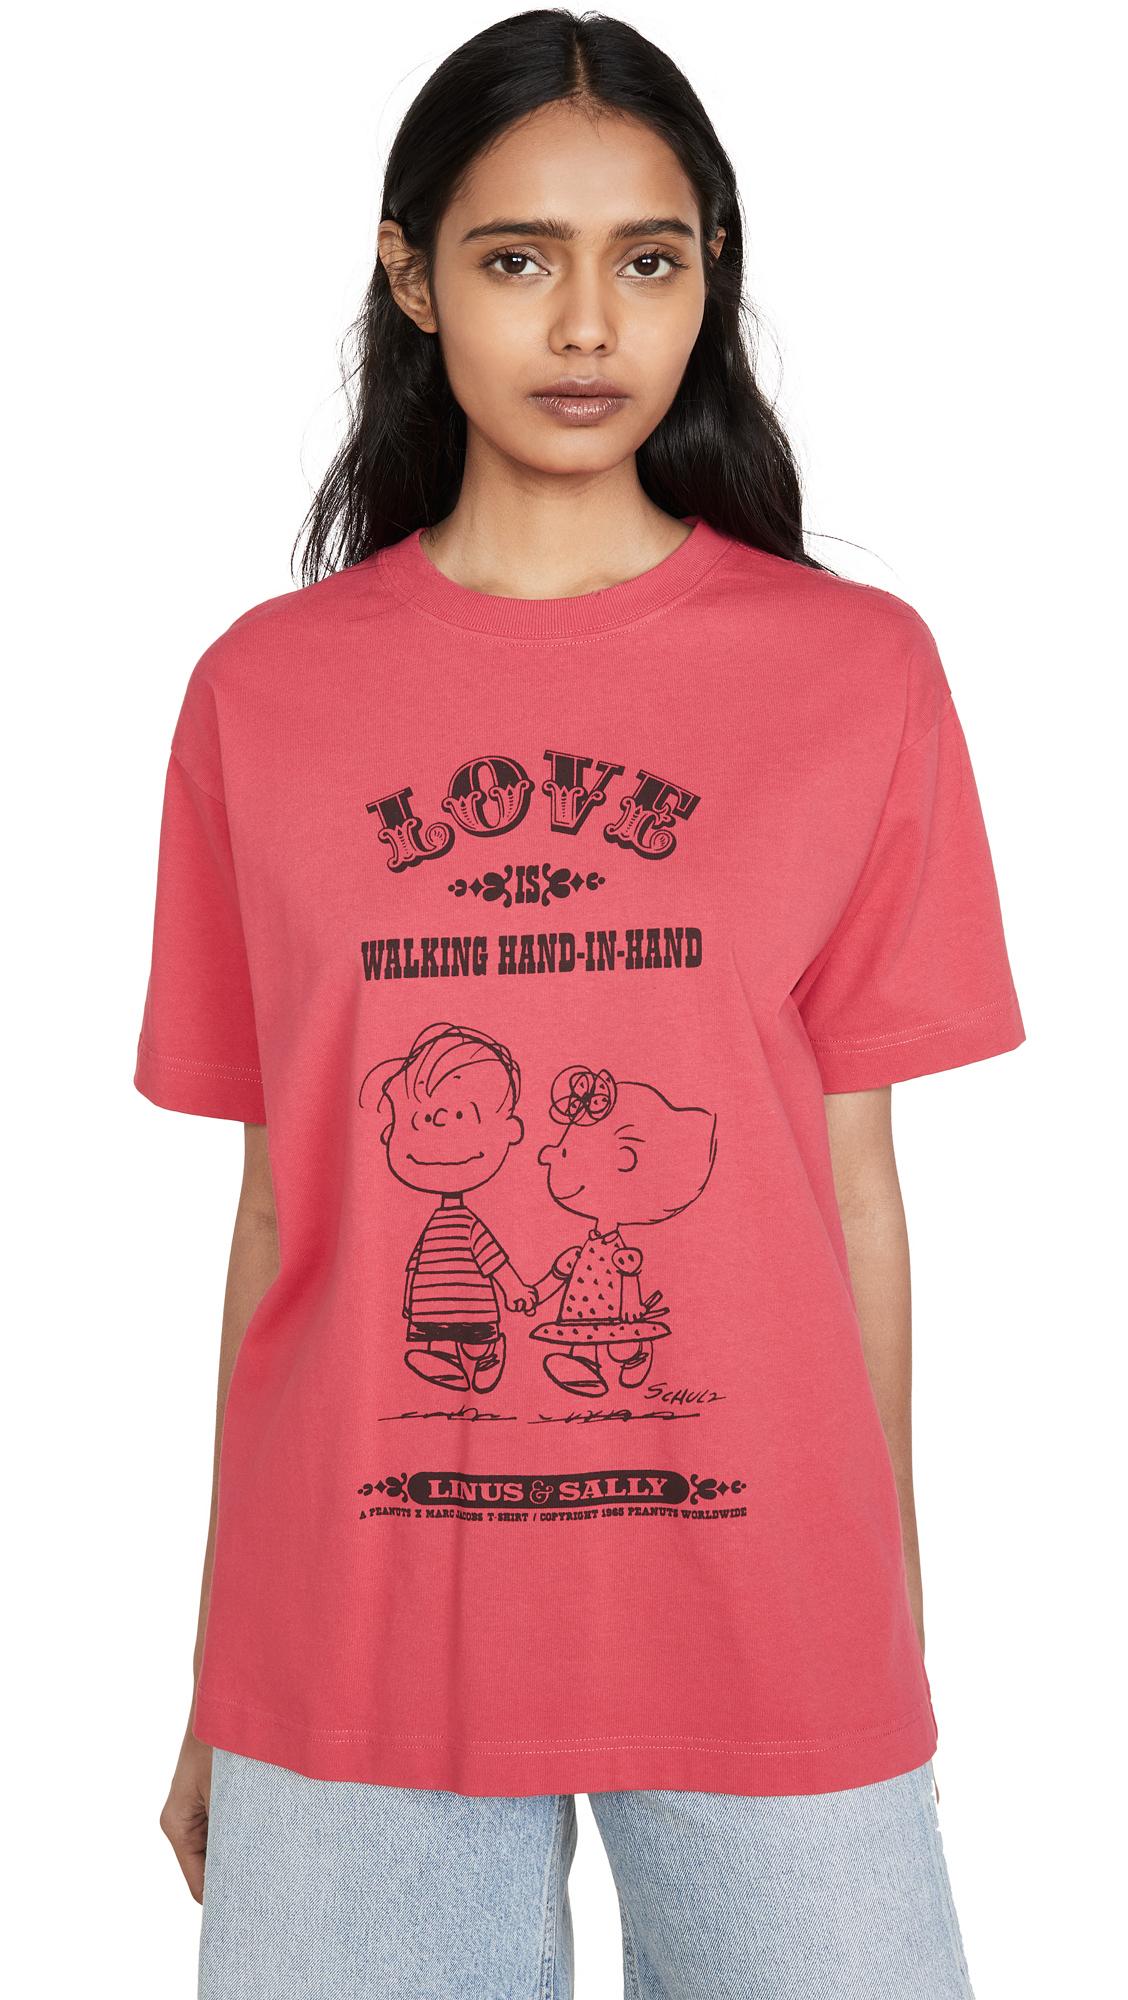 The Marc Jacobs x Peanuts Love T-Shirt